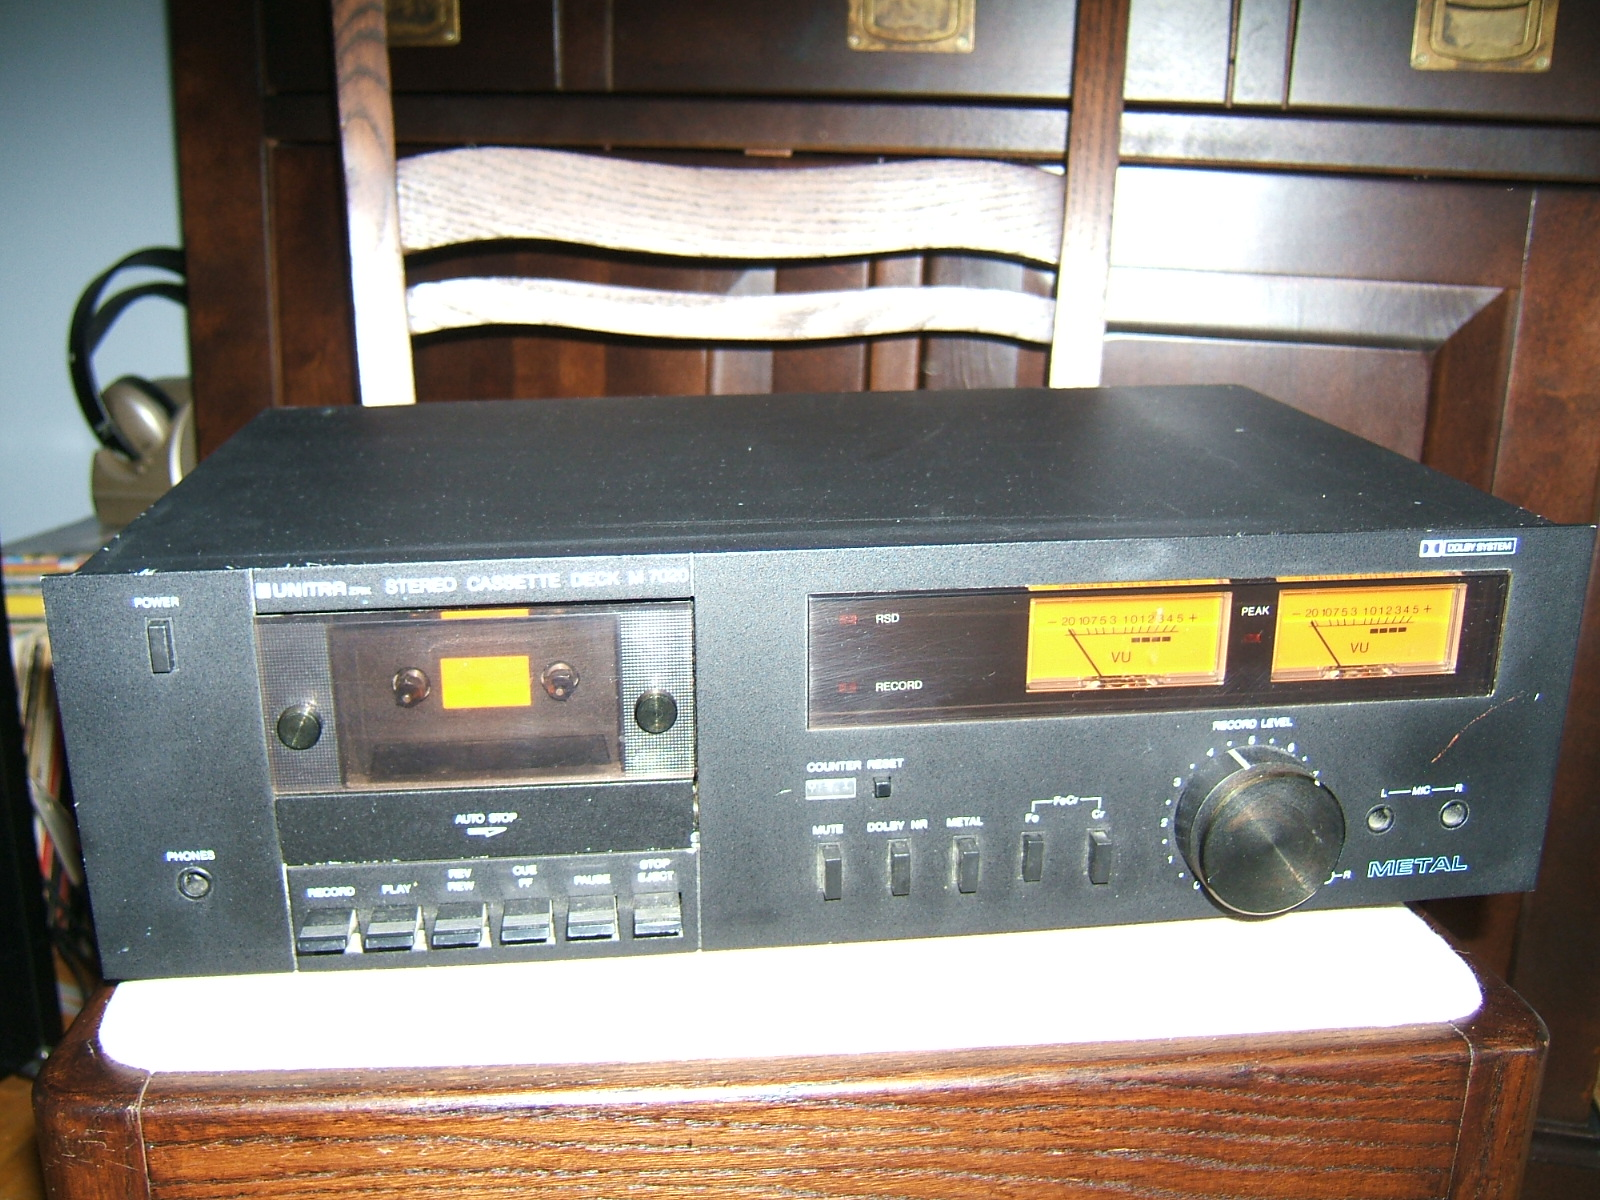 Unitra Stereo Cassette Deck M 7020